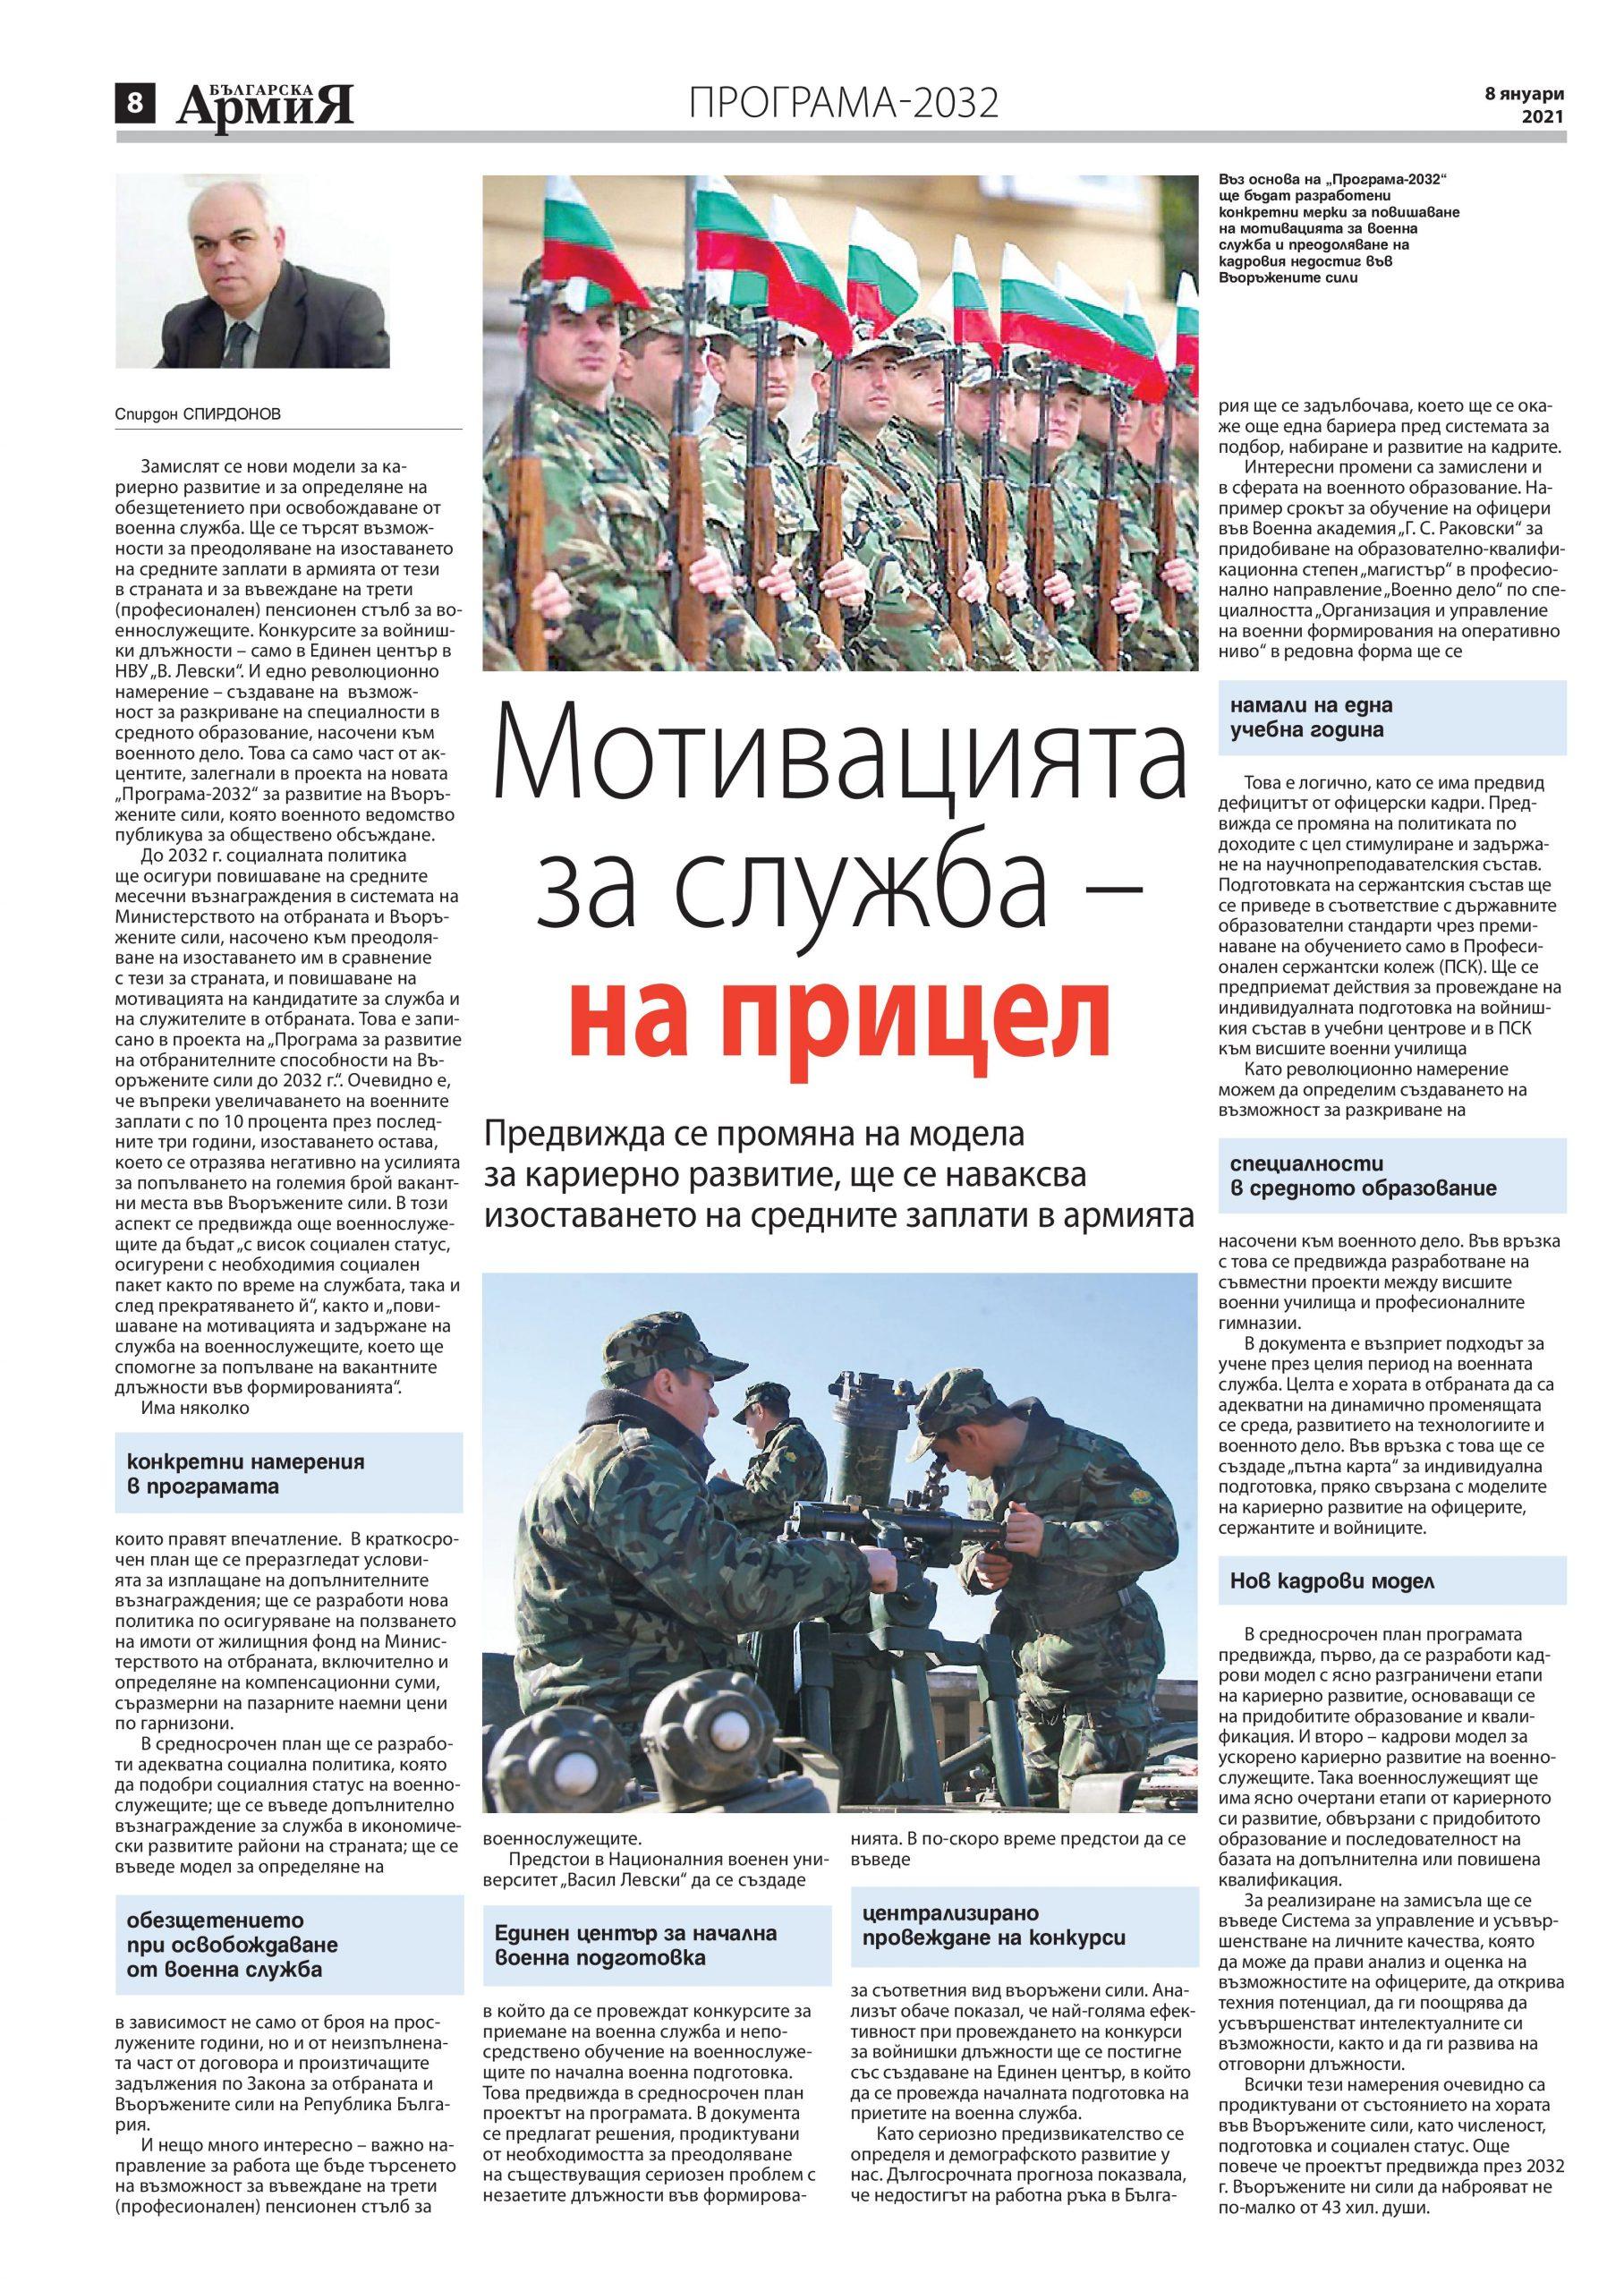 https://armymedia.bg/wp-content/uploads/2015/06/08-54-scaled.jpg